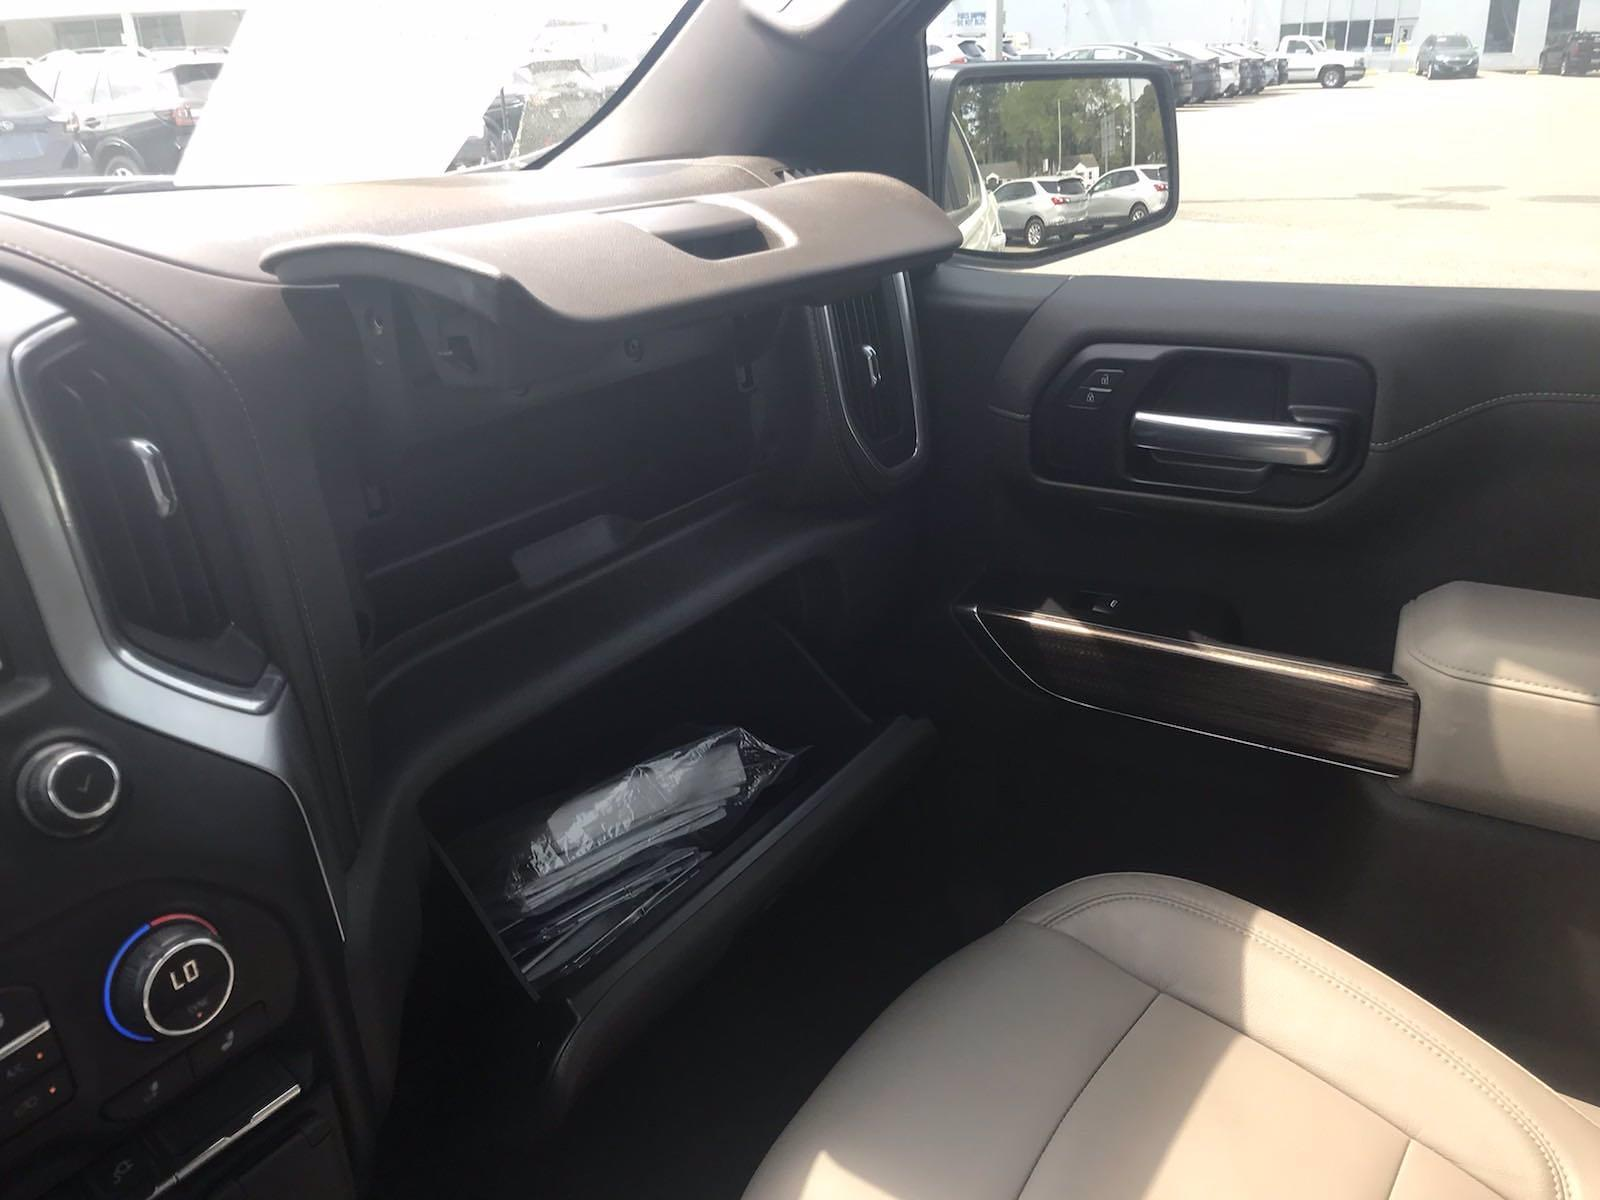 2020 Chevrolet Silverado 1500 Crew Cab 4x4, Pickup #16431PN - photo 39